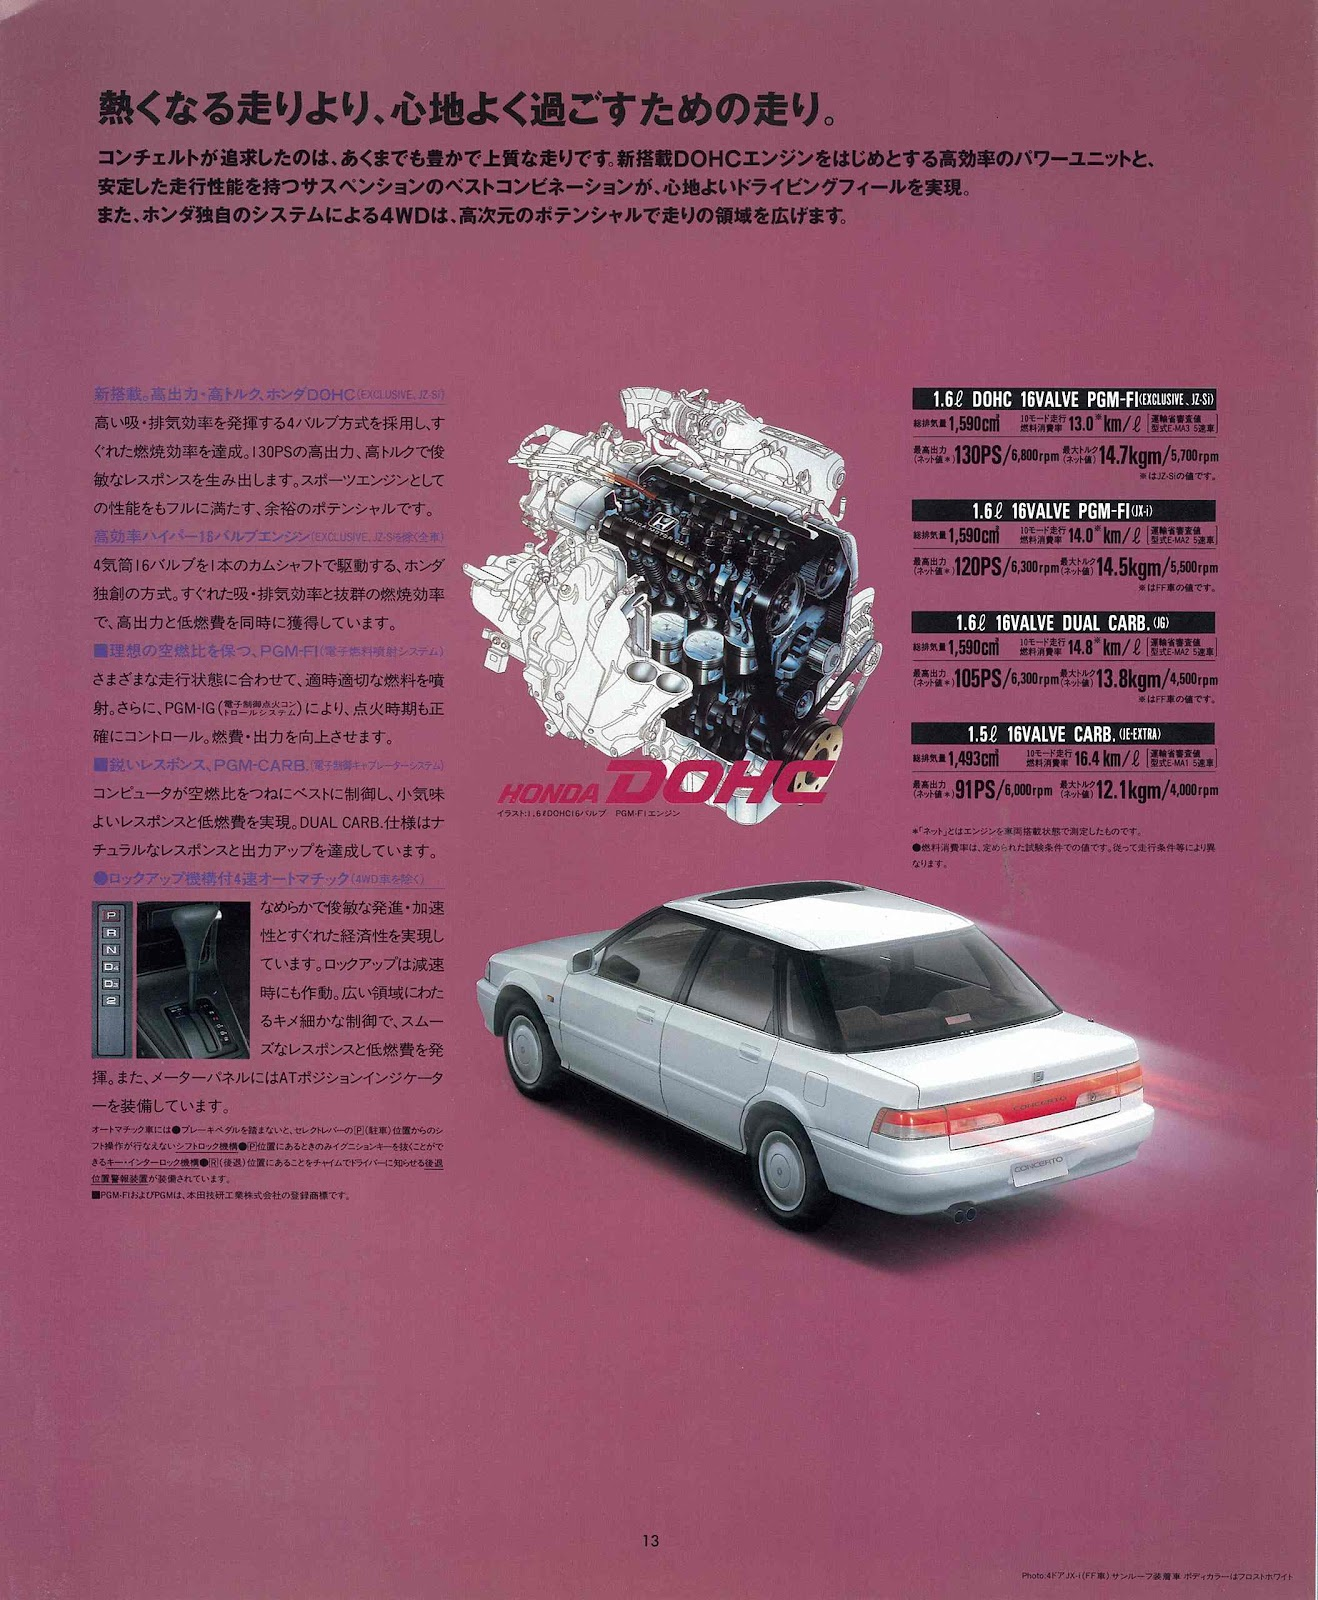 Honda Concerto, silnik, specyfikacja, dane techniczne, 1.5, 1.6